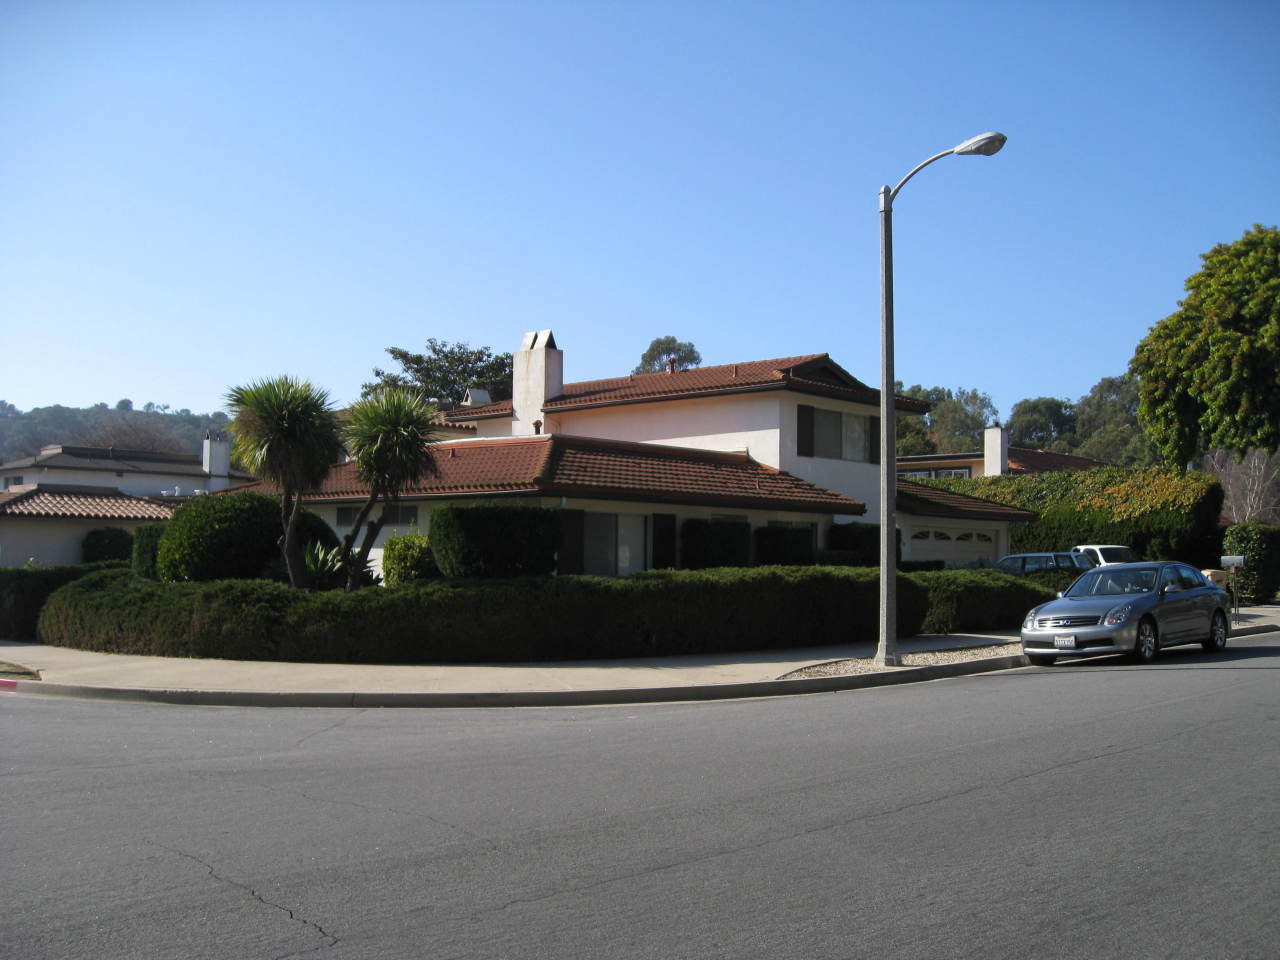 Property photo for 3749 Mariana Way Santa Barbara, California 93105 - 12-185